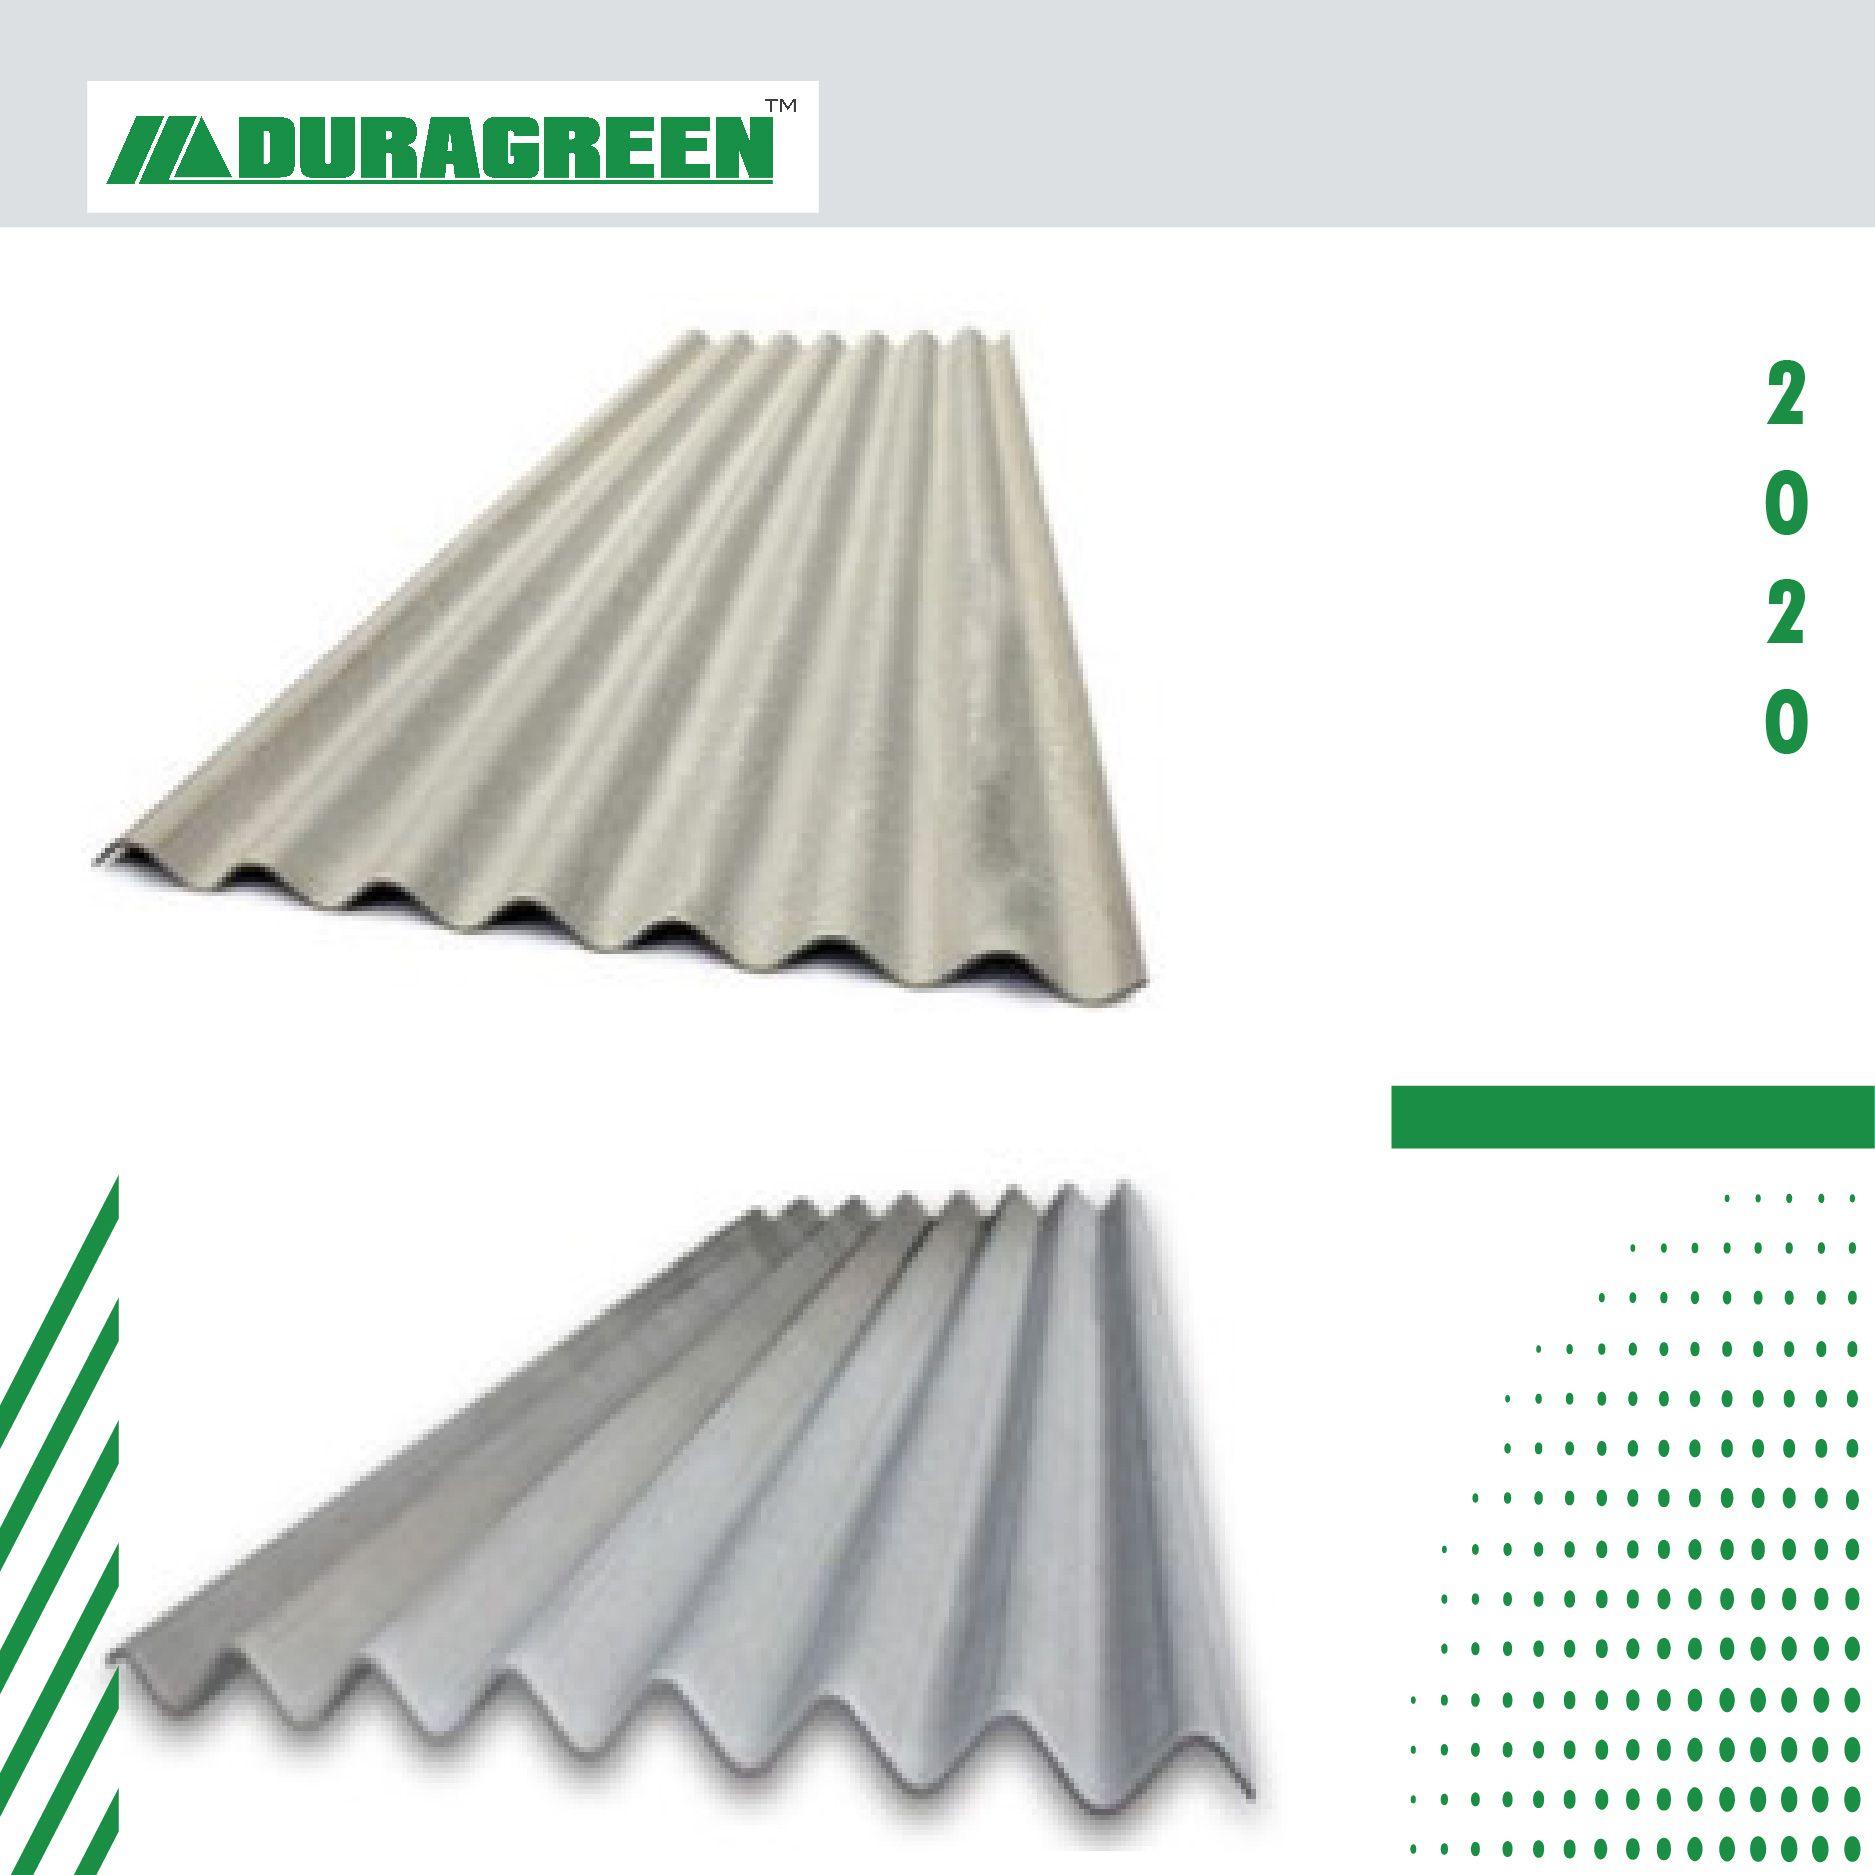 Big Wave And Medium Wave Of Fiber Cement Corrugated Roofing Sheet In 2020 Corrugated Roofing Roofing Sheets Fiber Cement